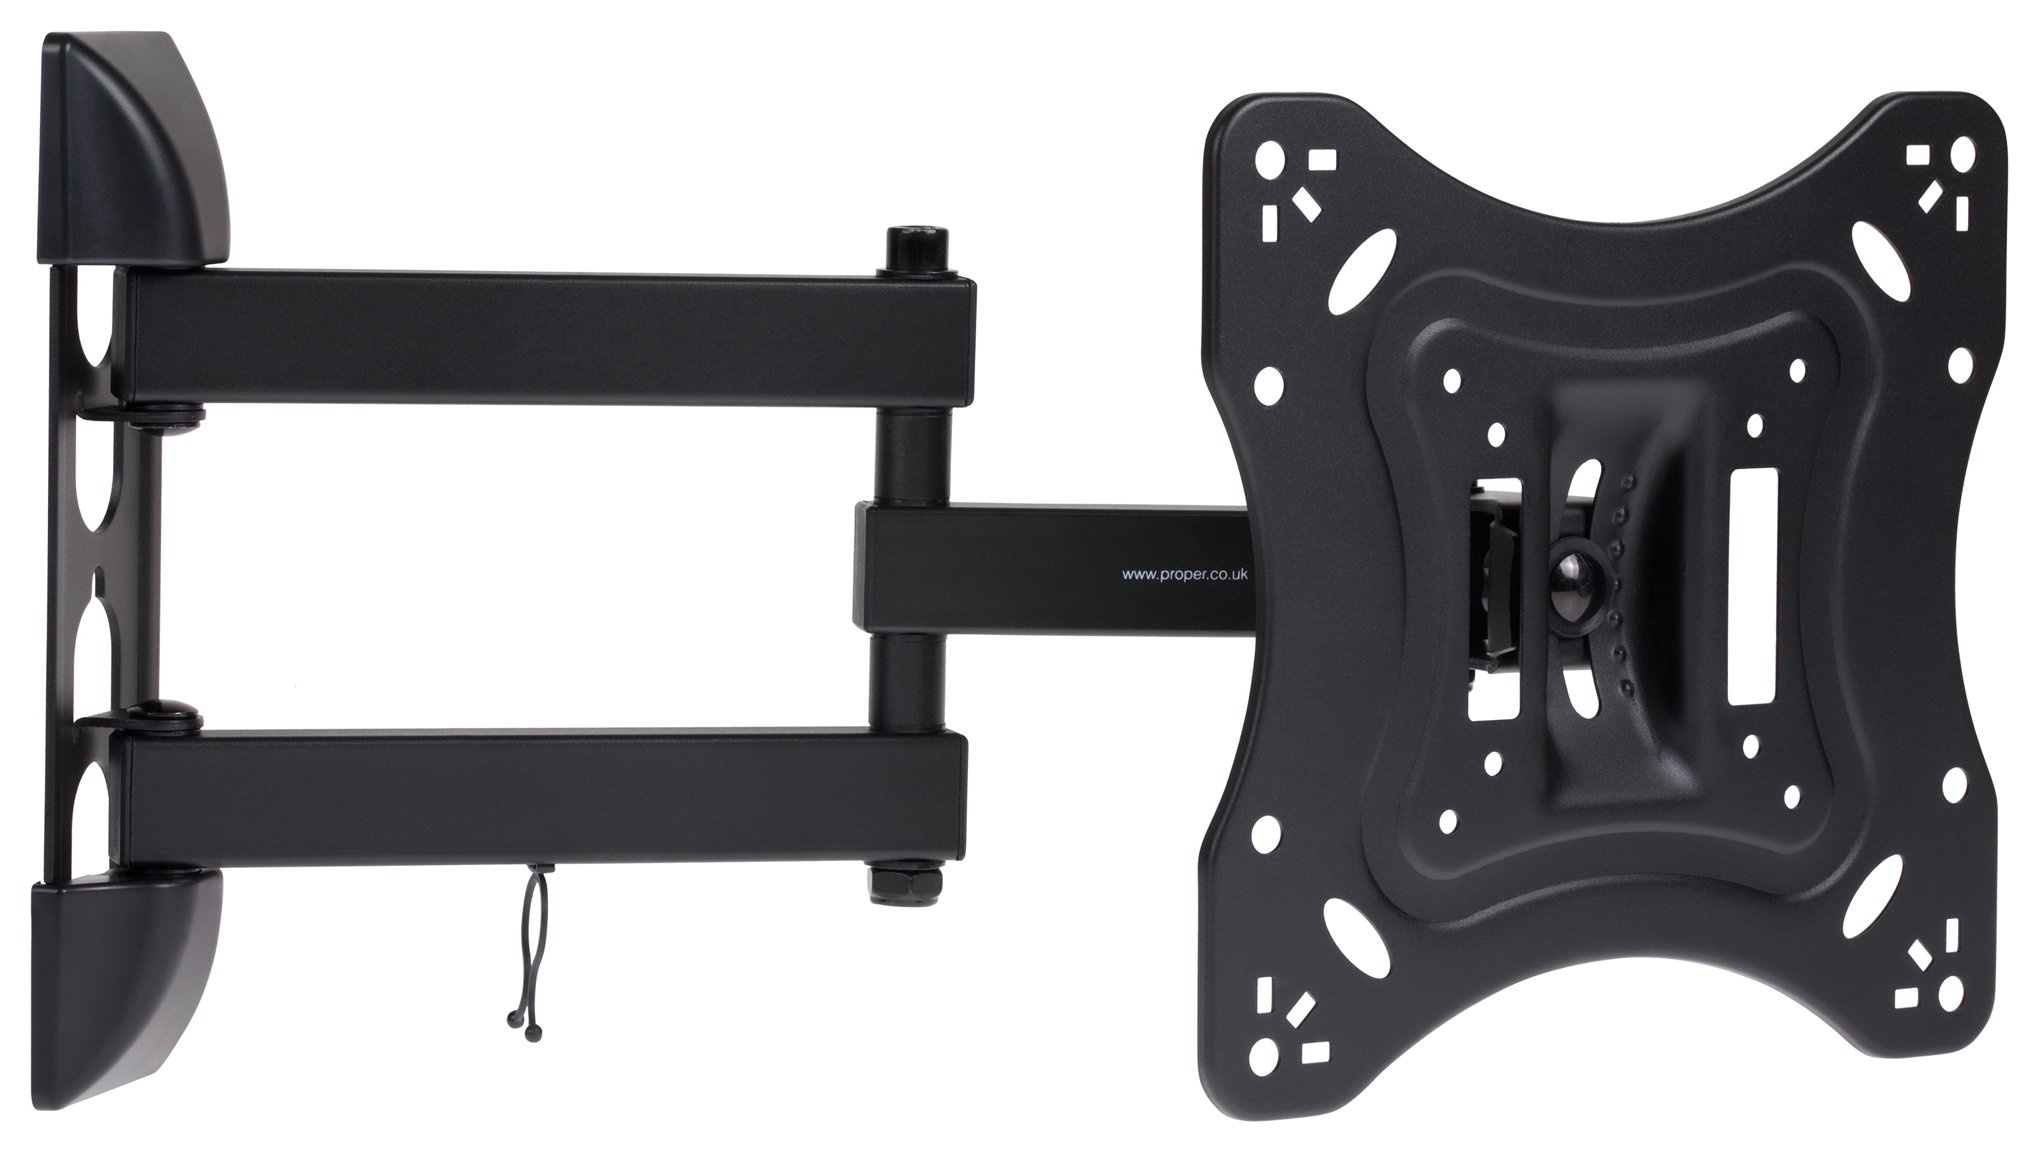 sale on proper heavy duty swing arm 23 55 inch tv wall. Black Bedroom Furniture Sets. Home Design Ideas